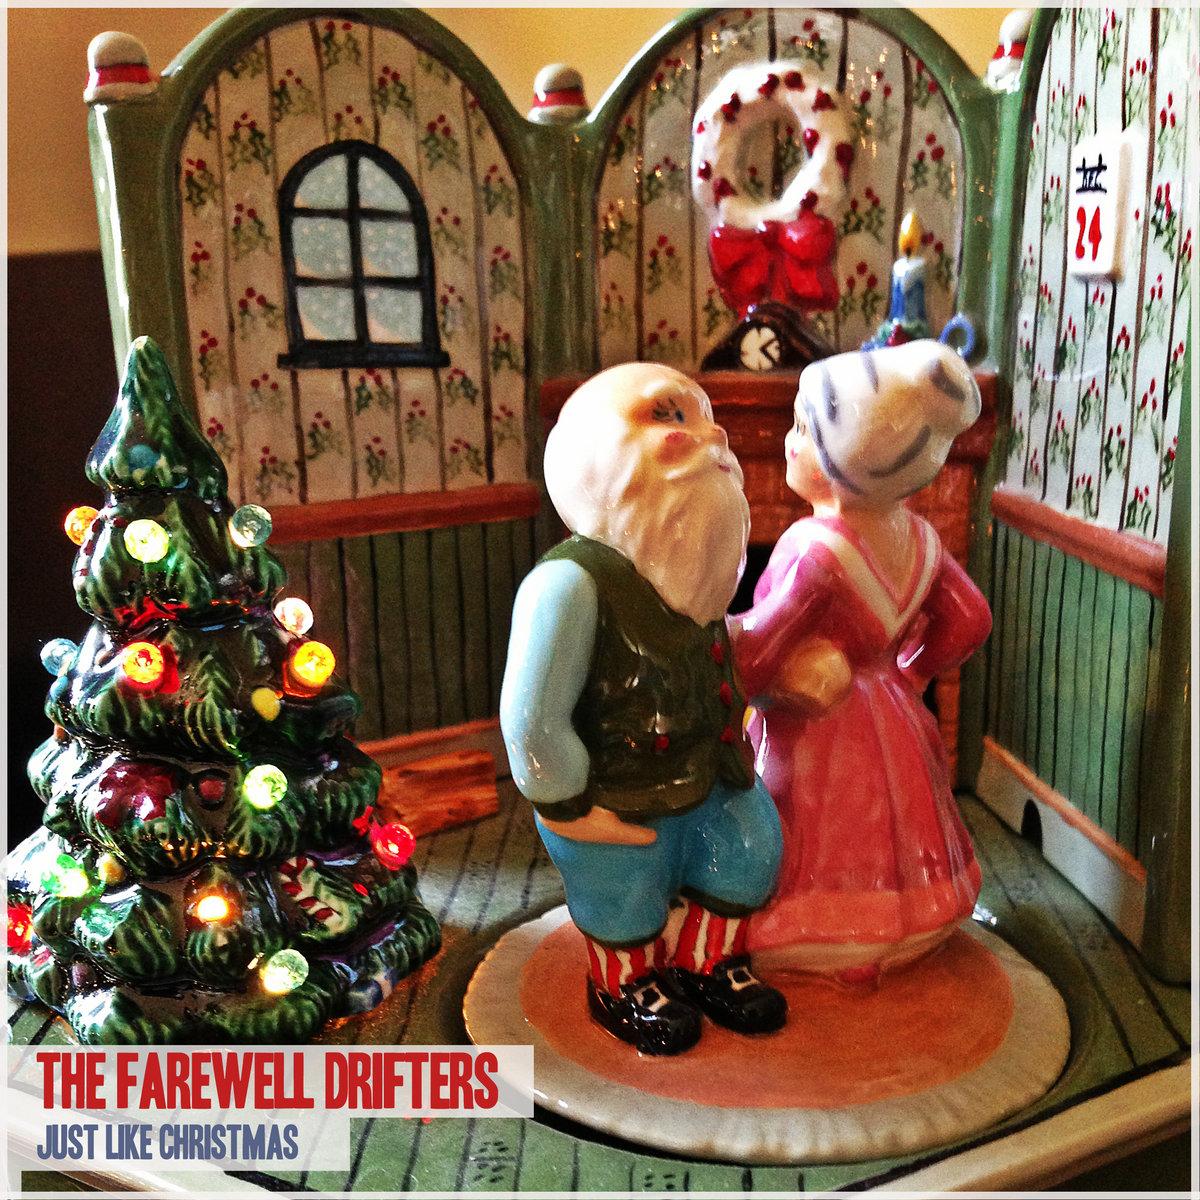 Just Like Christmas | The Farewell Drifters